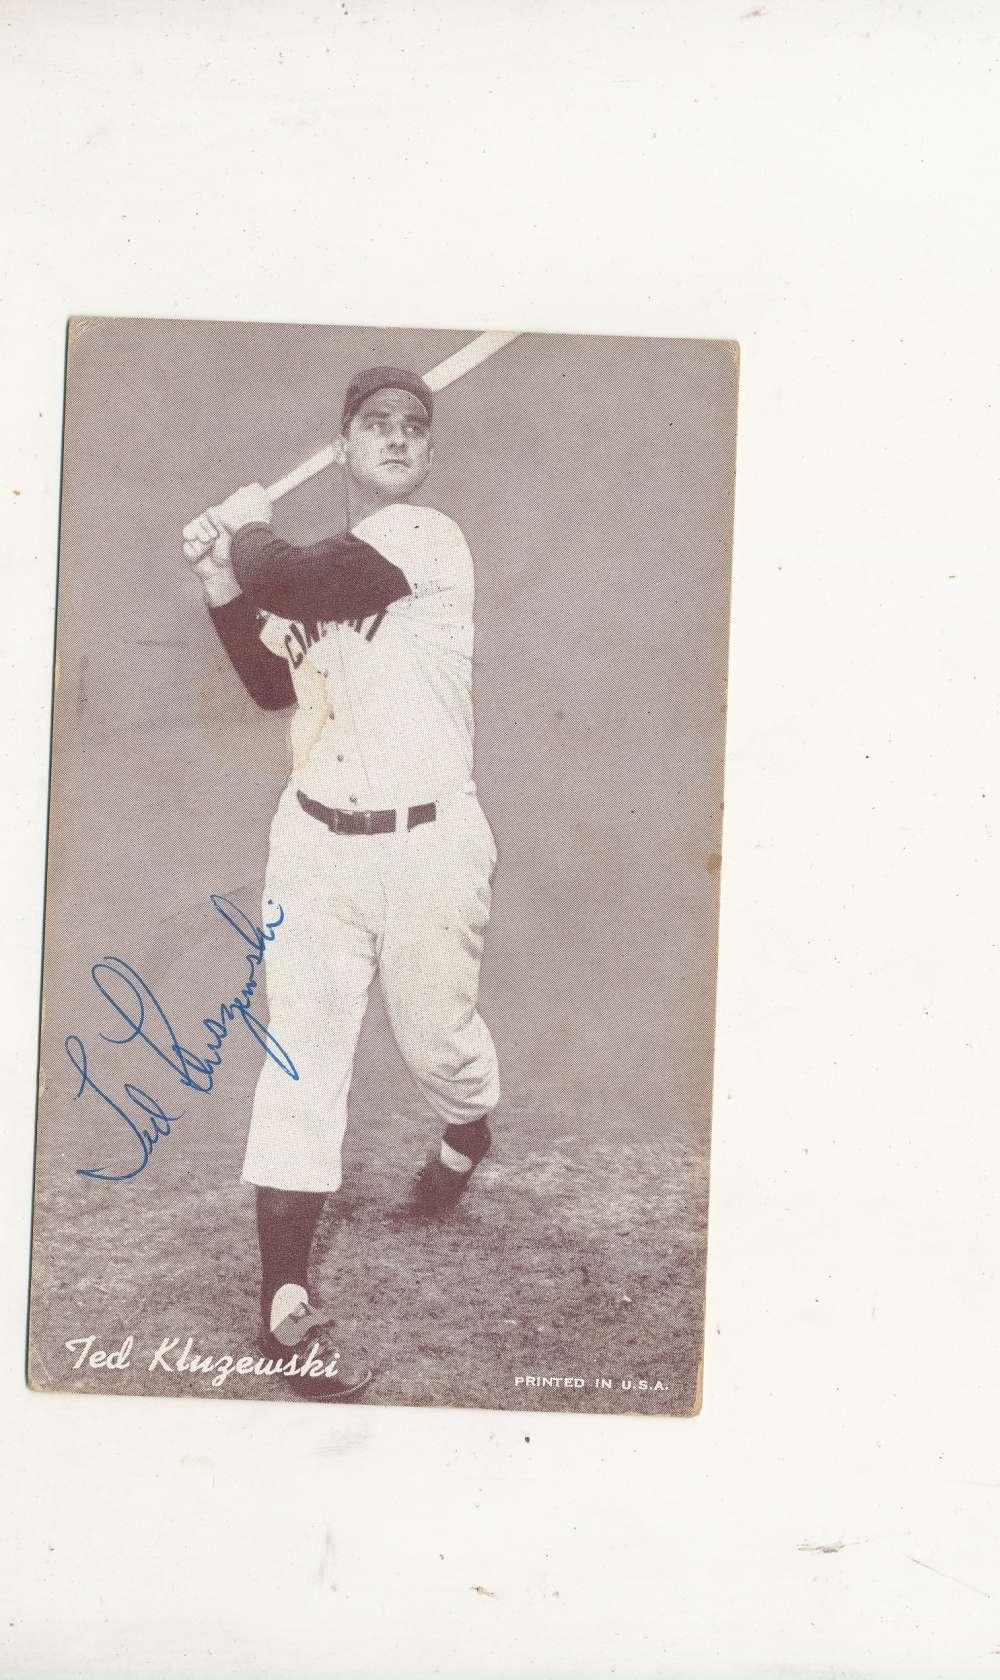 Ted Kluzewski reds  Signed 1946-1966 exhibit card